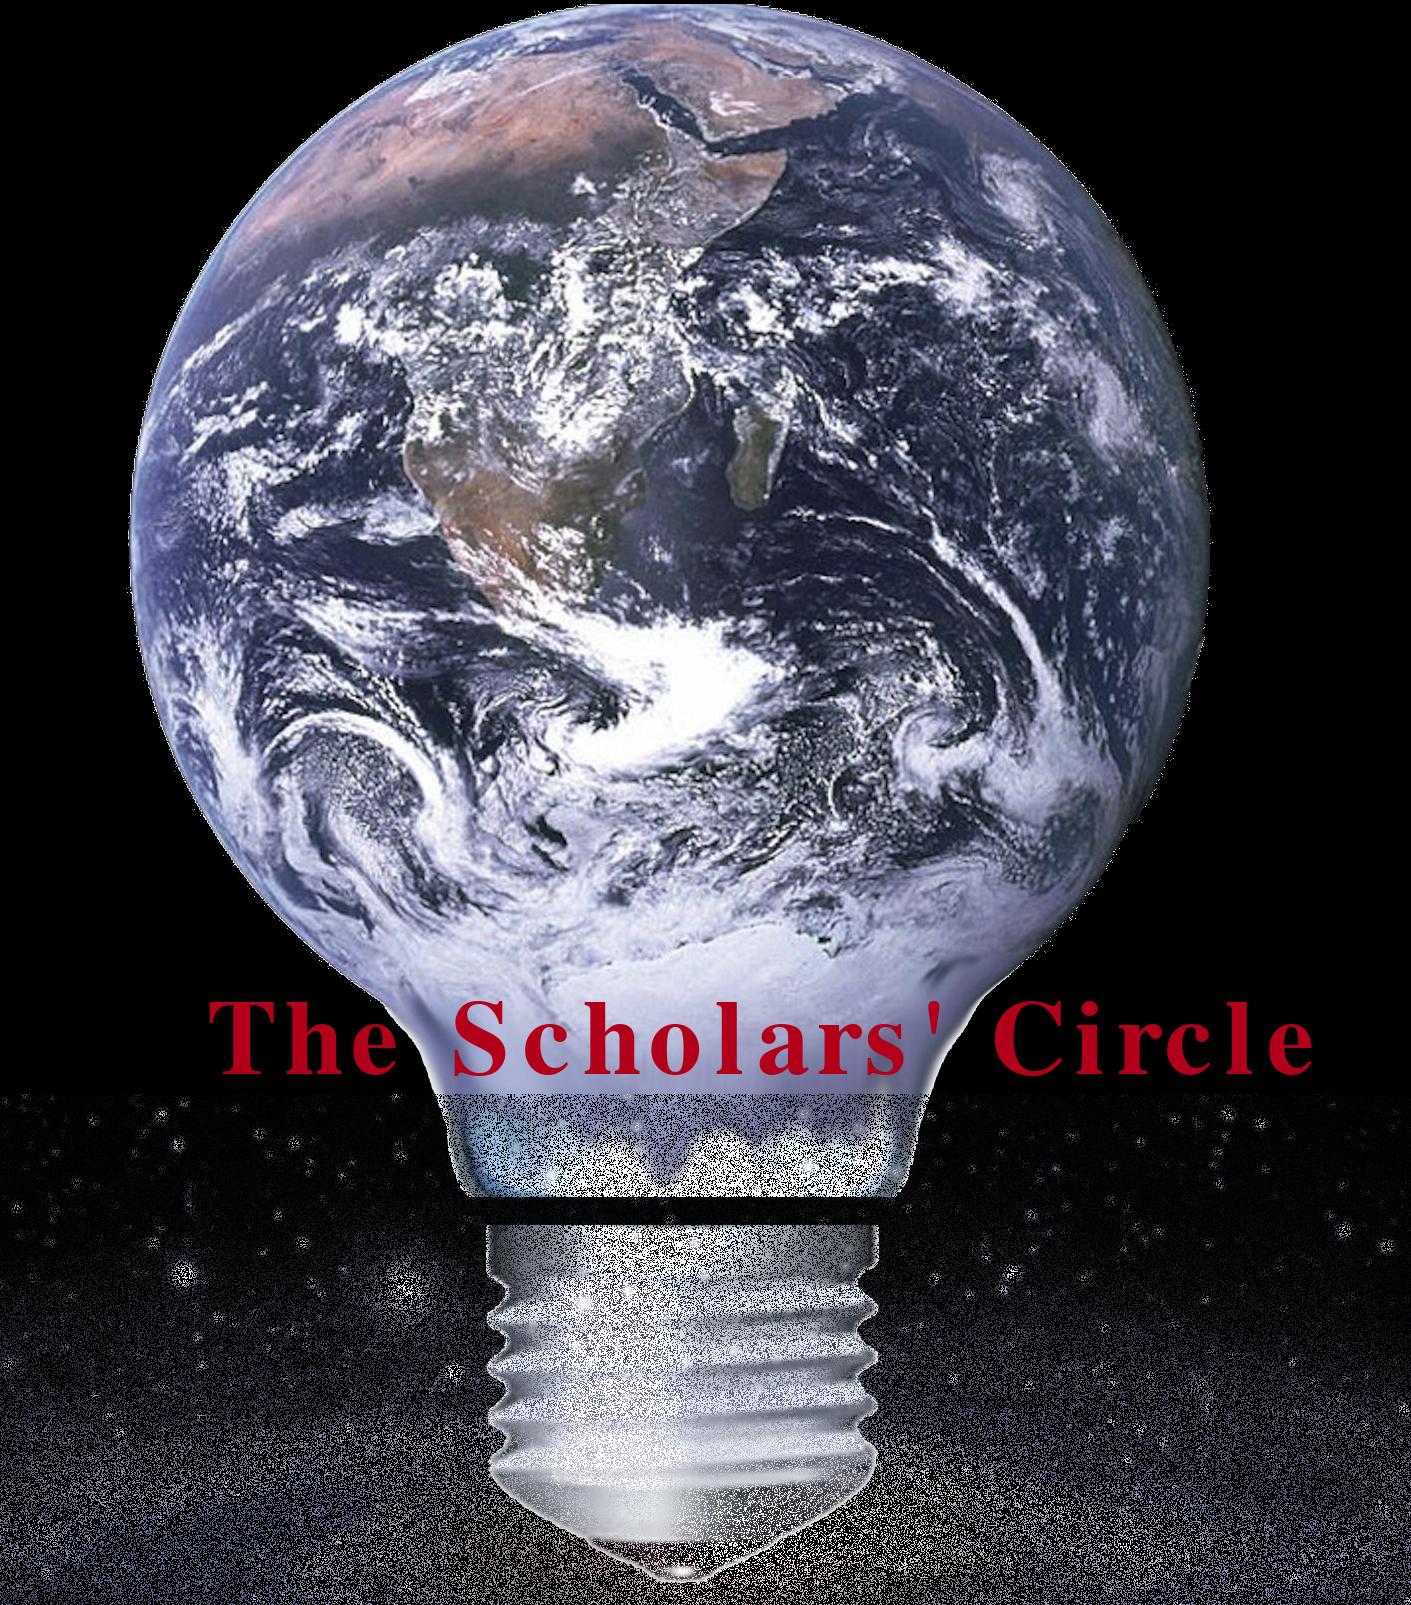 The Scholars' Circle